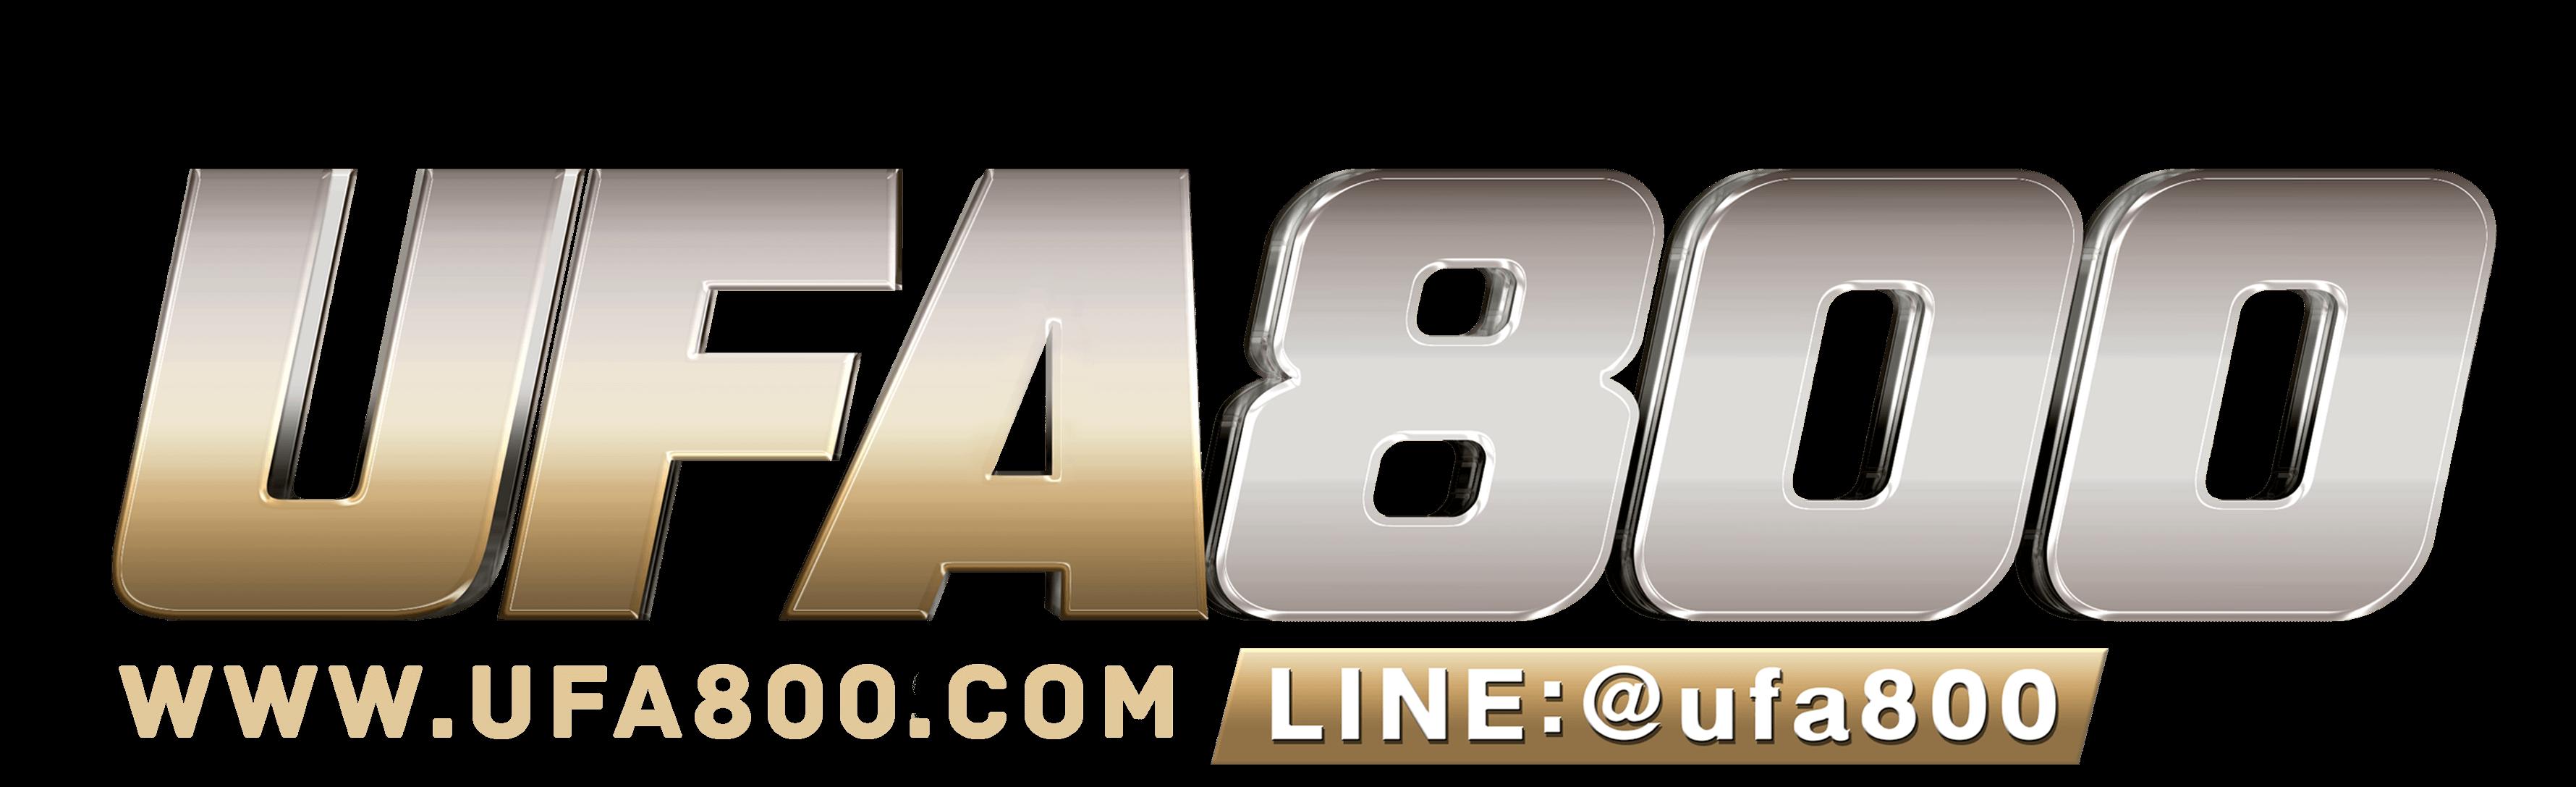 ufa800-logo